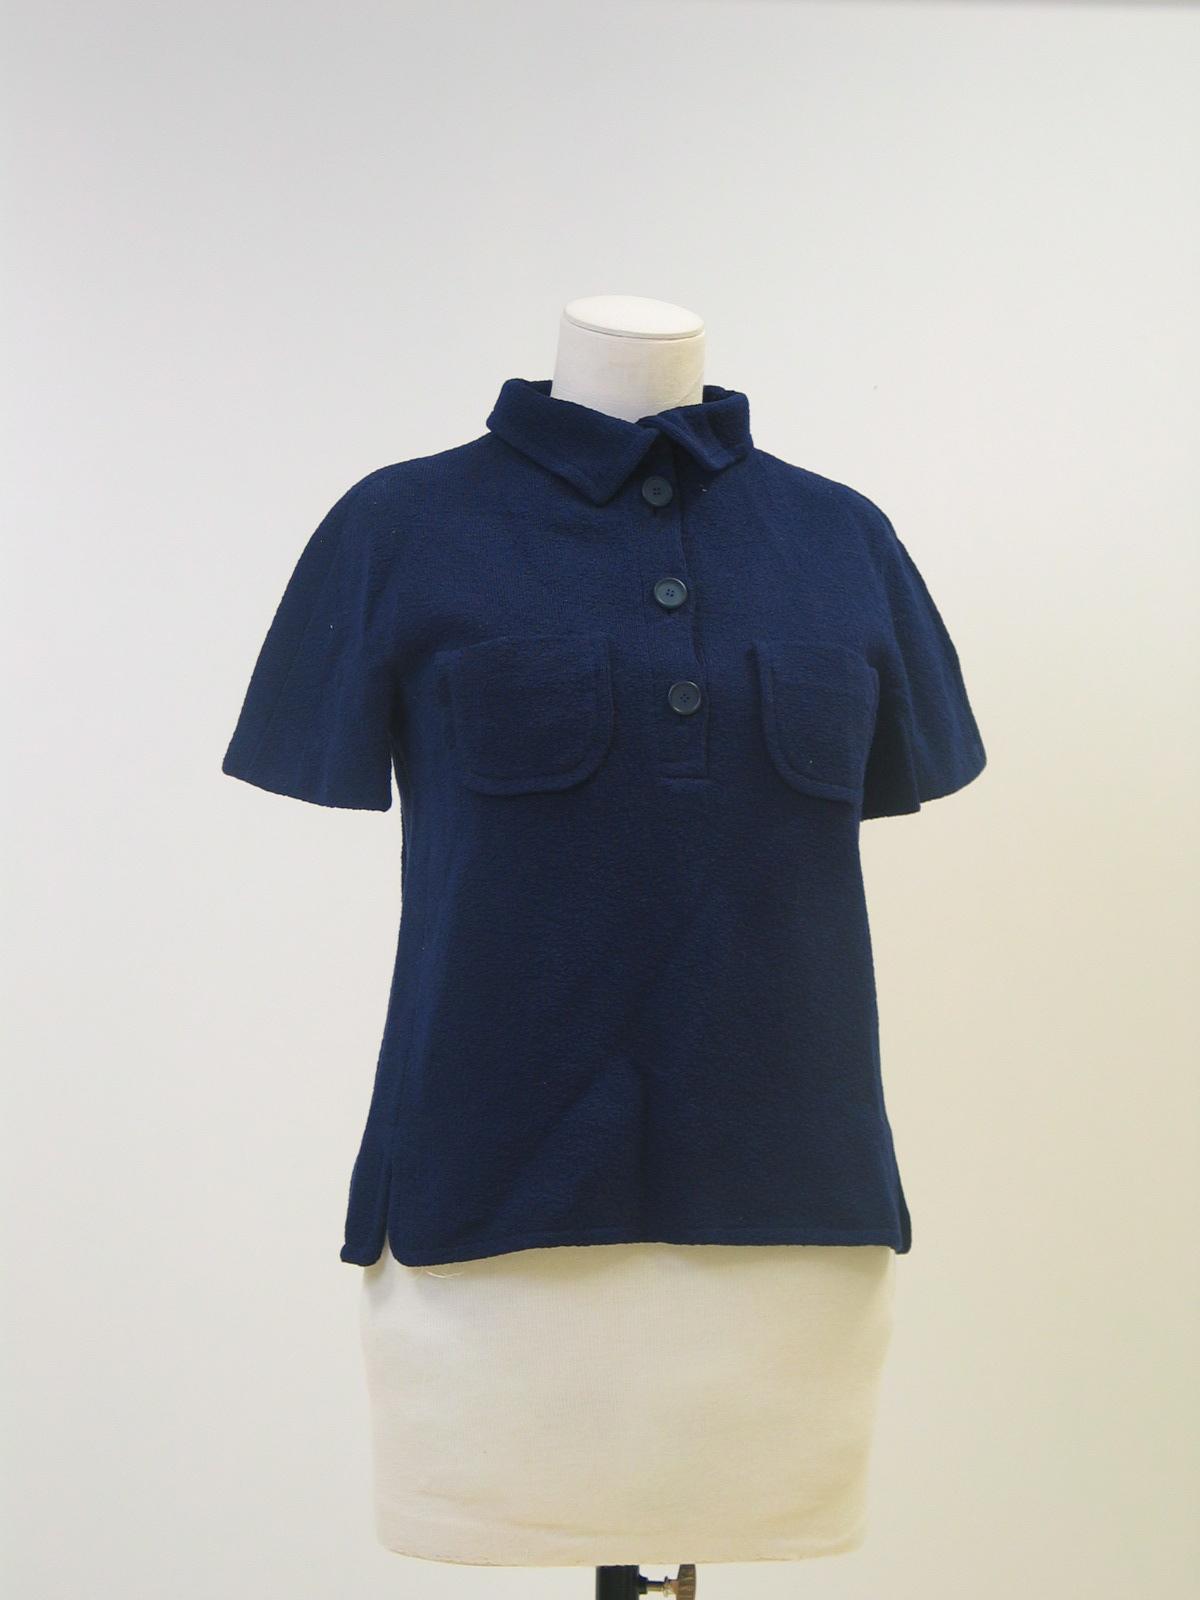 Blusa-Polo en punto azul marino, manga corta